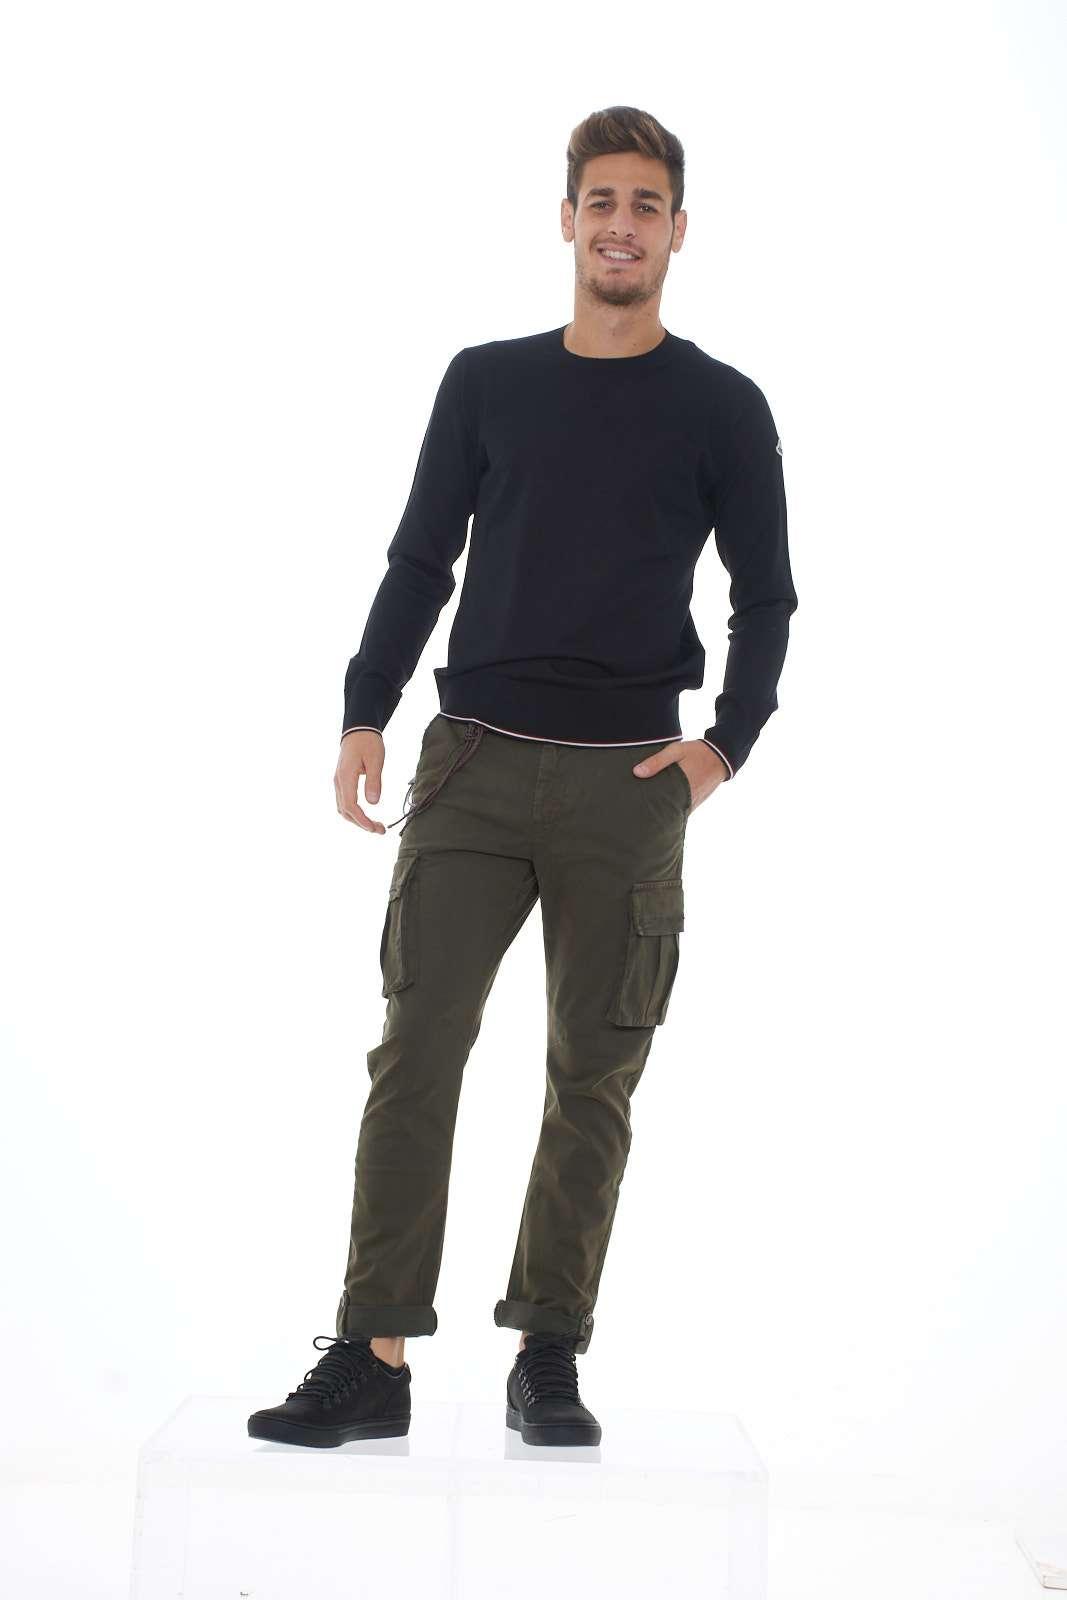 https://www.parmax.com/media/catalog/product/A/I/AI-outlet_parmax-pantaloni-uomo-Squad-gvc9711-D.jpg